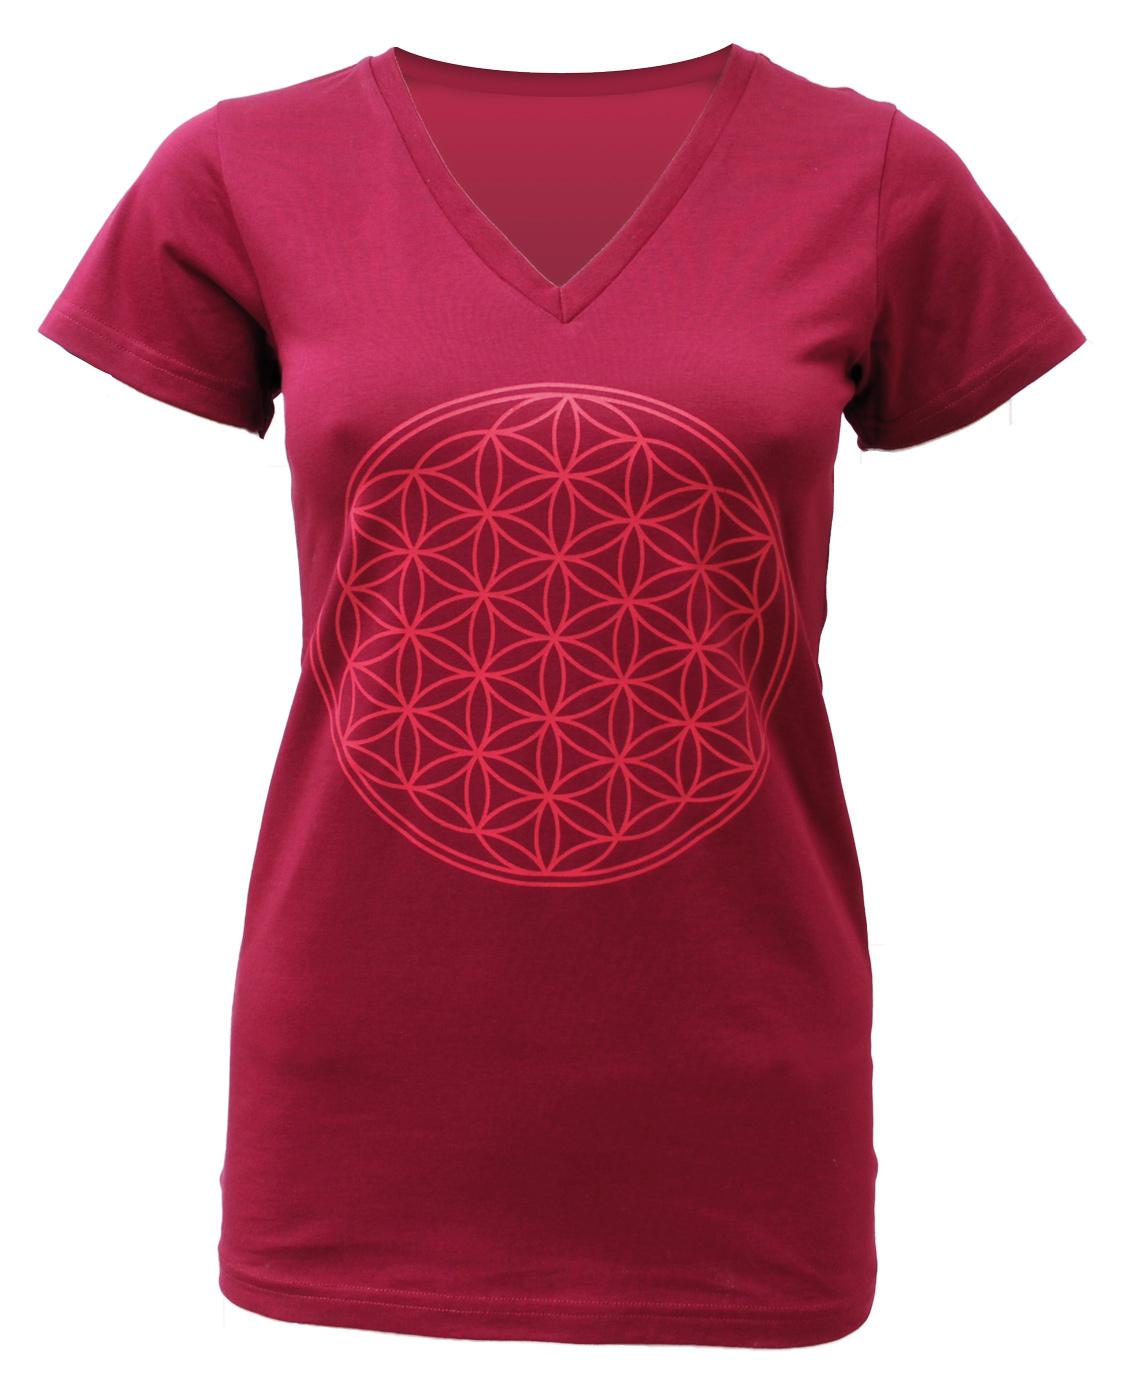 Yogi T Shirt Quot Flower Of Life Quot Bordeaux Buy Online At